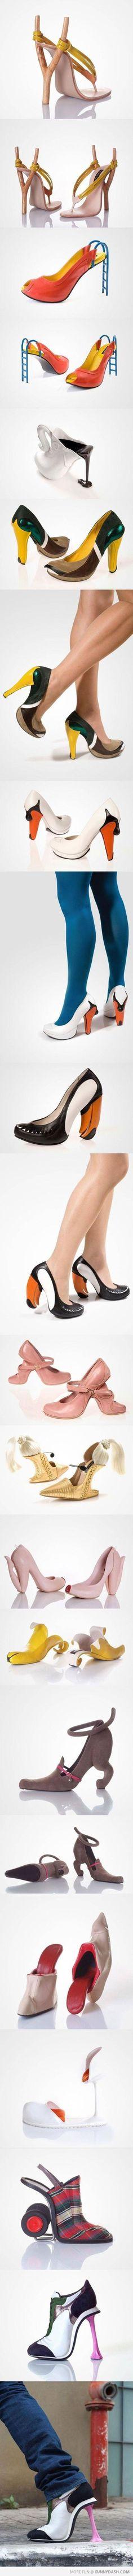 Funky High Heel Designs